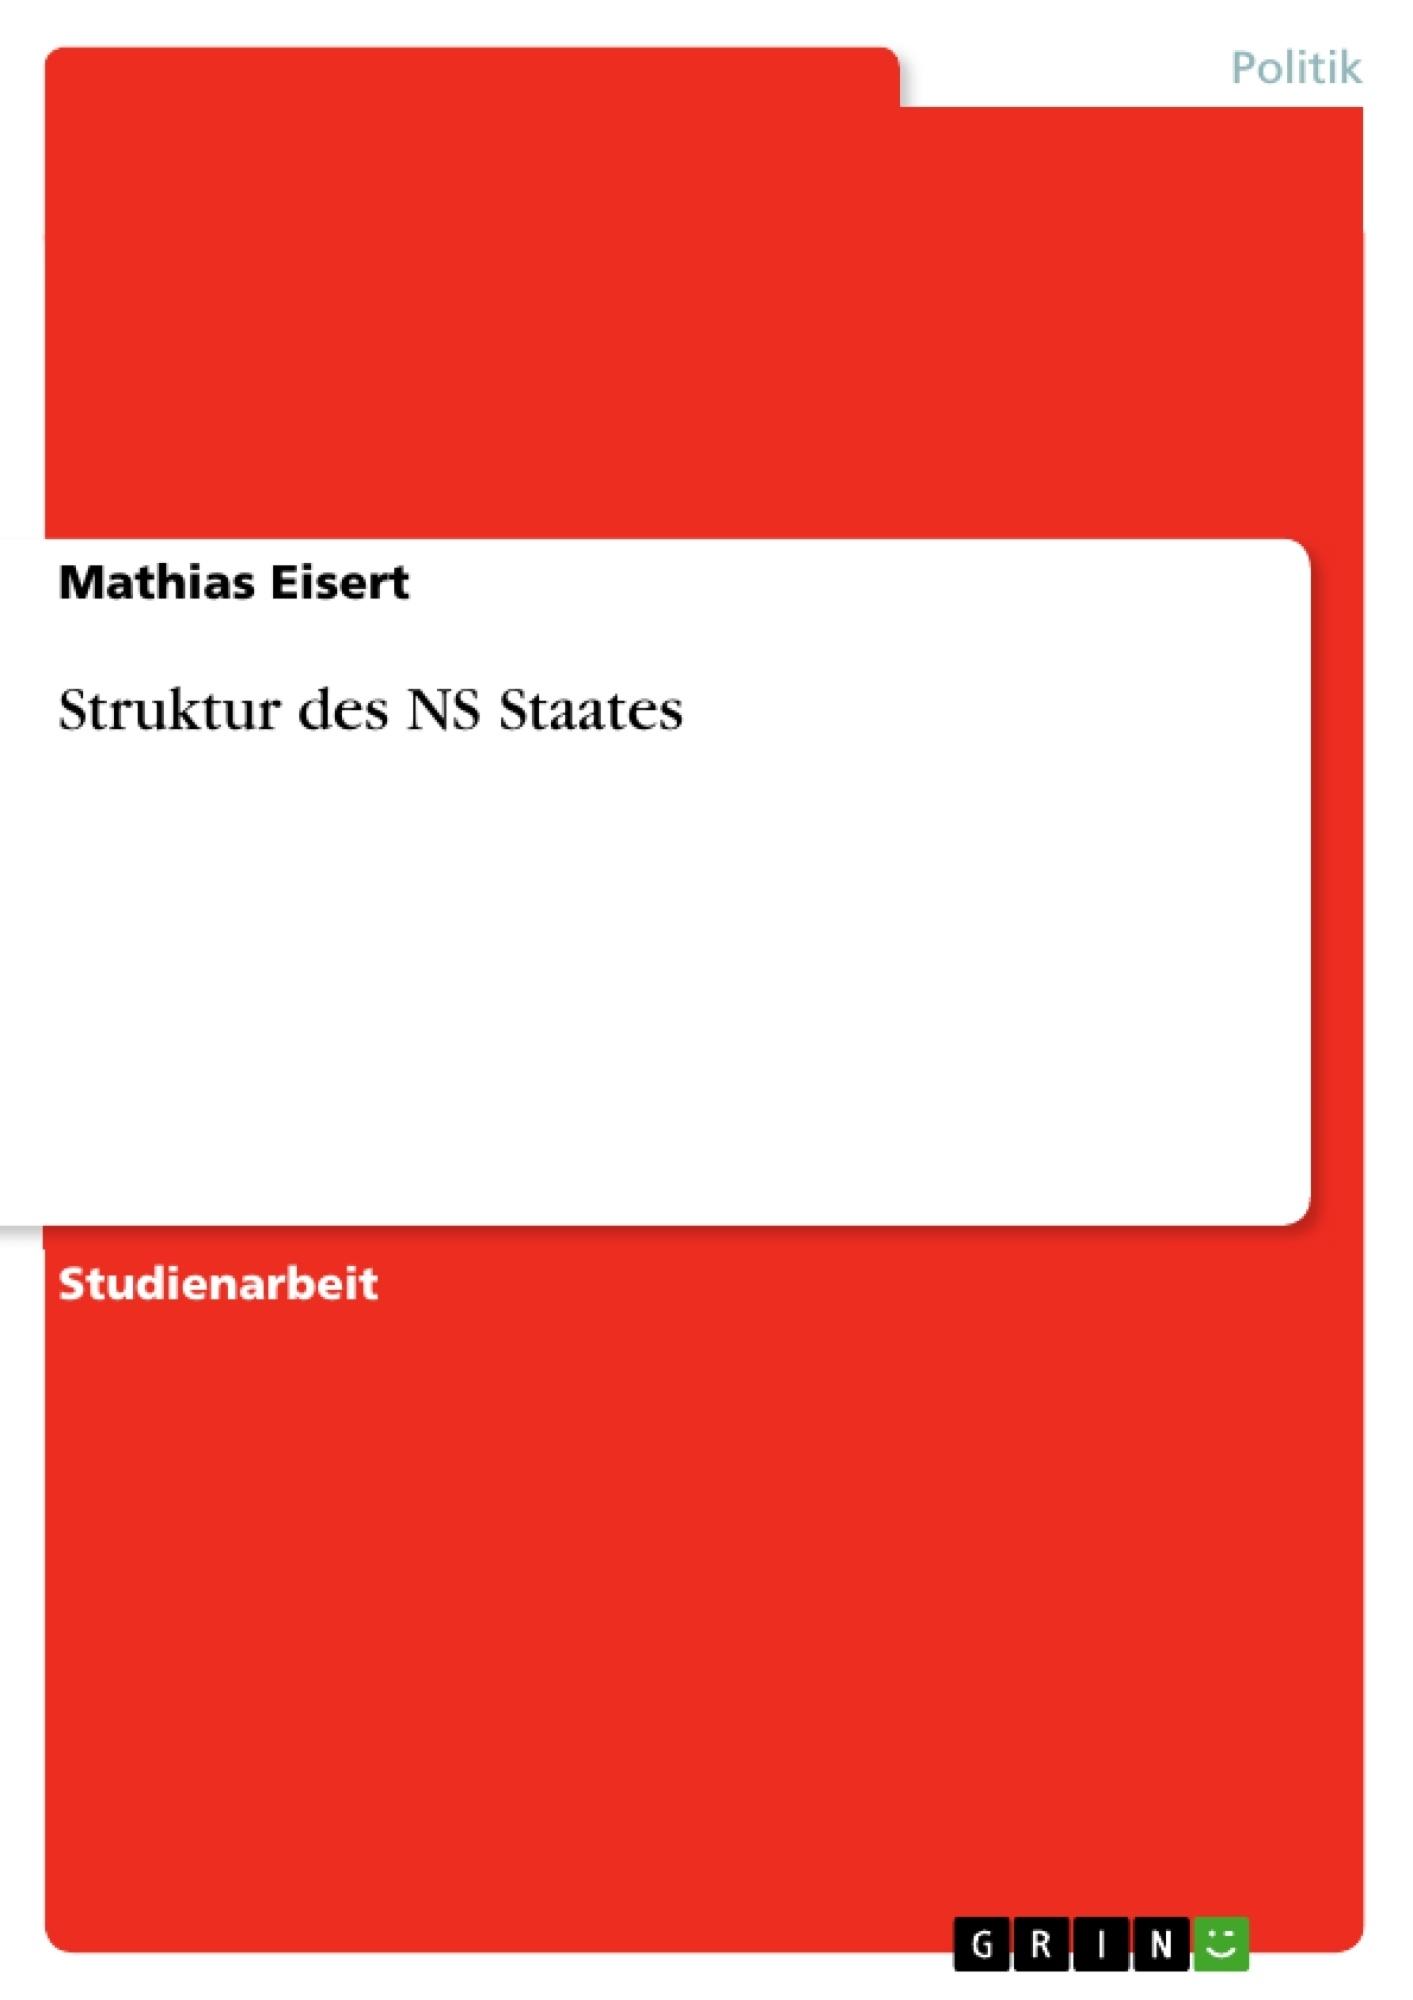 Titel: Struktur des NS Staates